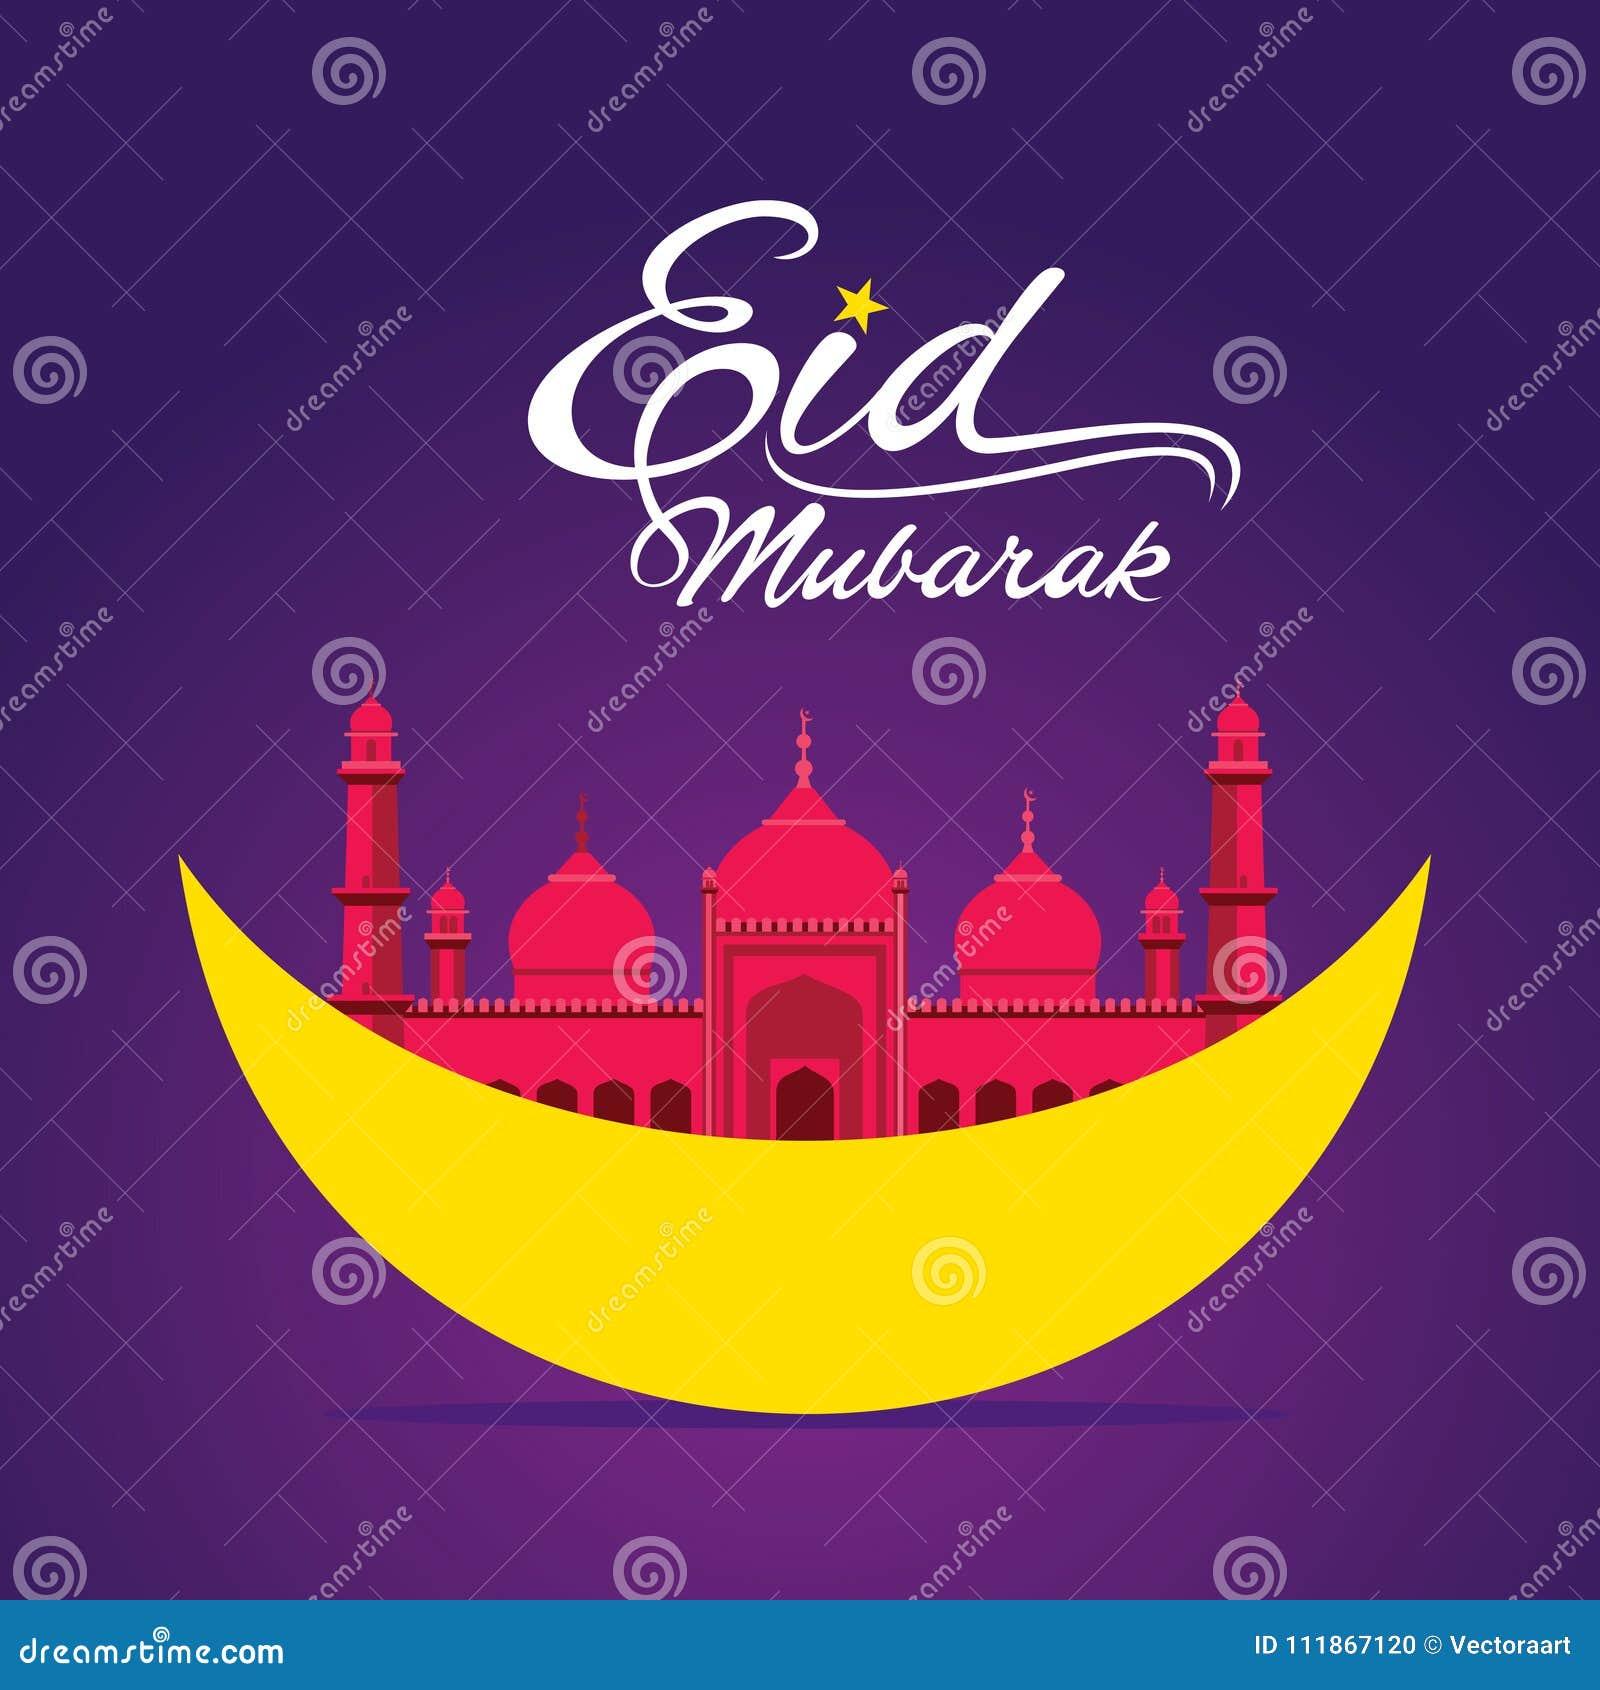 Happy eid mubarak greeting design stock vector illustration of download happy eid mubarak greeting design stock vector illustration of design arabic 111867120 m4hsunfo